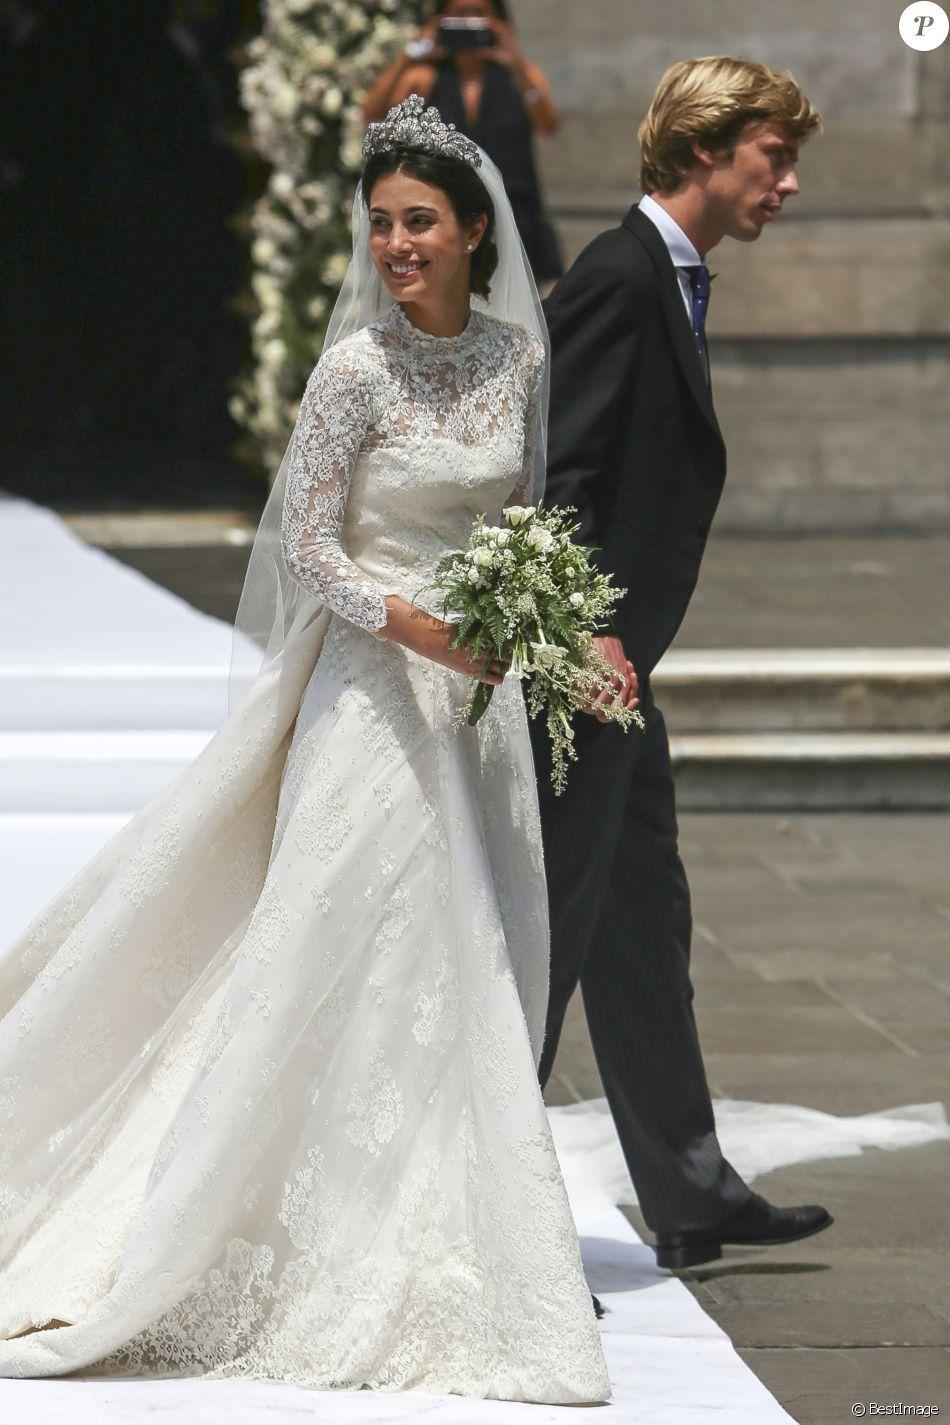 Christian De Hanovre Et Sassa De Osma Mariage Princier Devant Kate Moss Robes De Mariage Célèbres Robes De Mariée Royales Mariage Princier